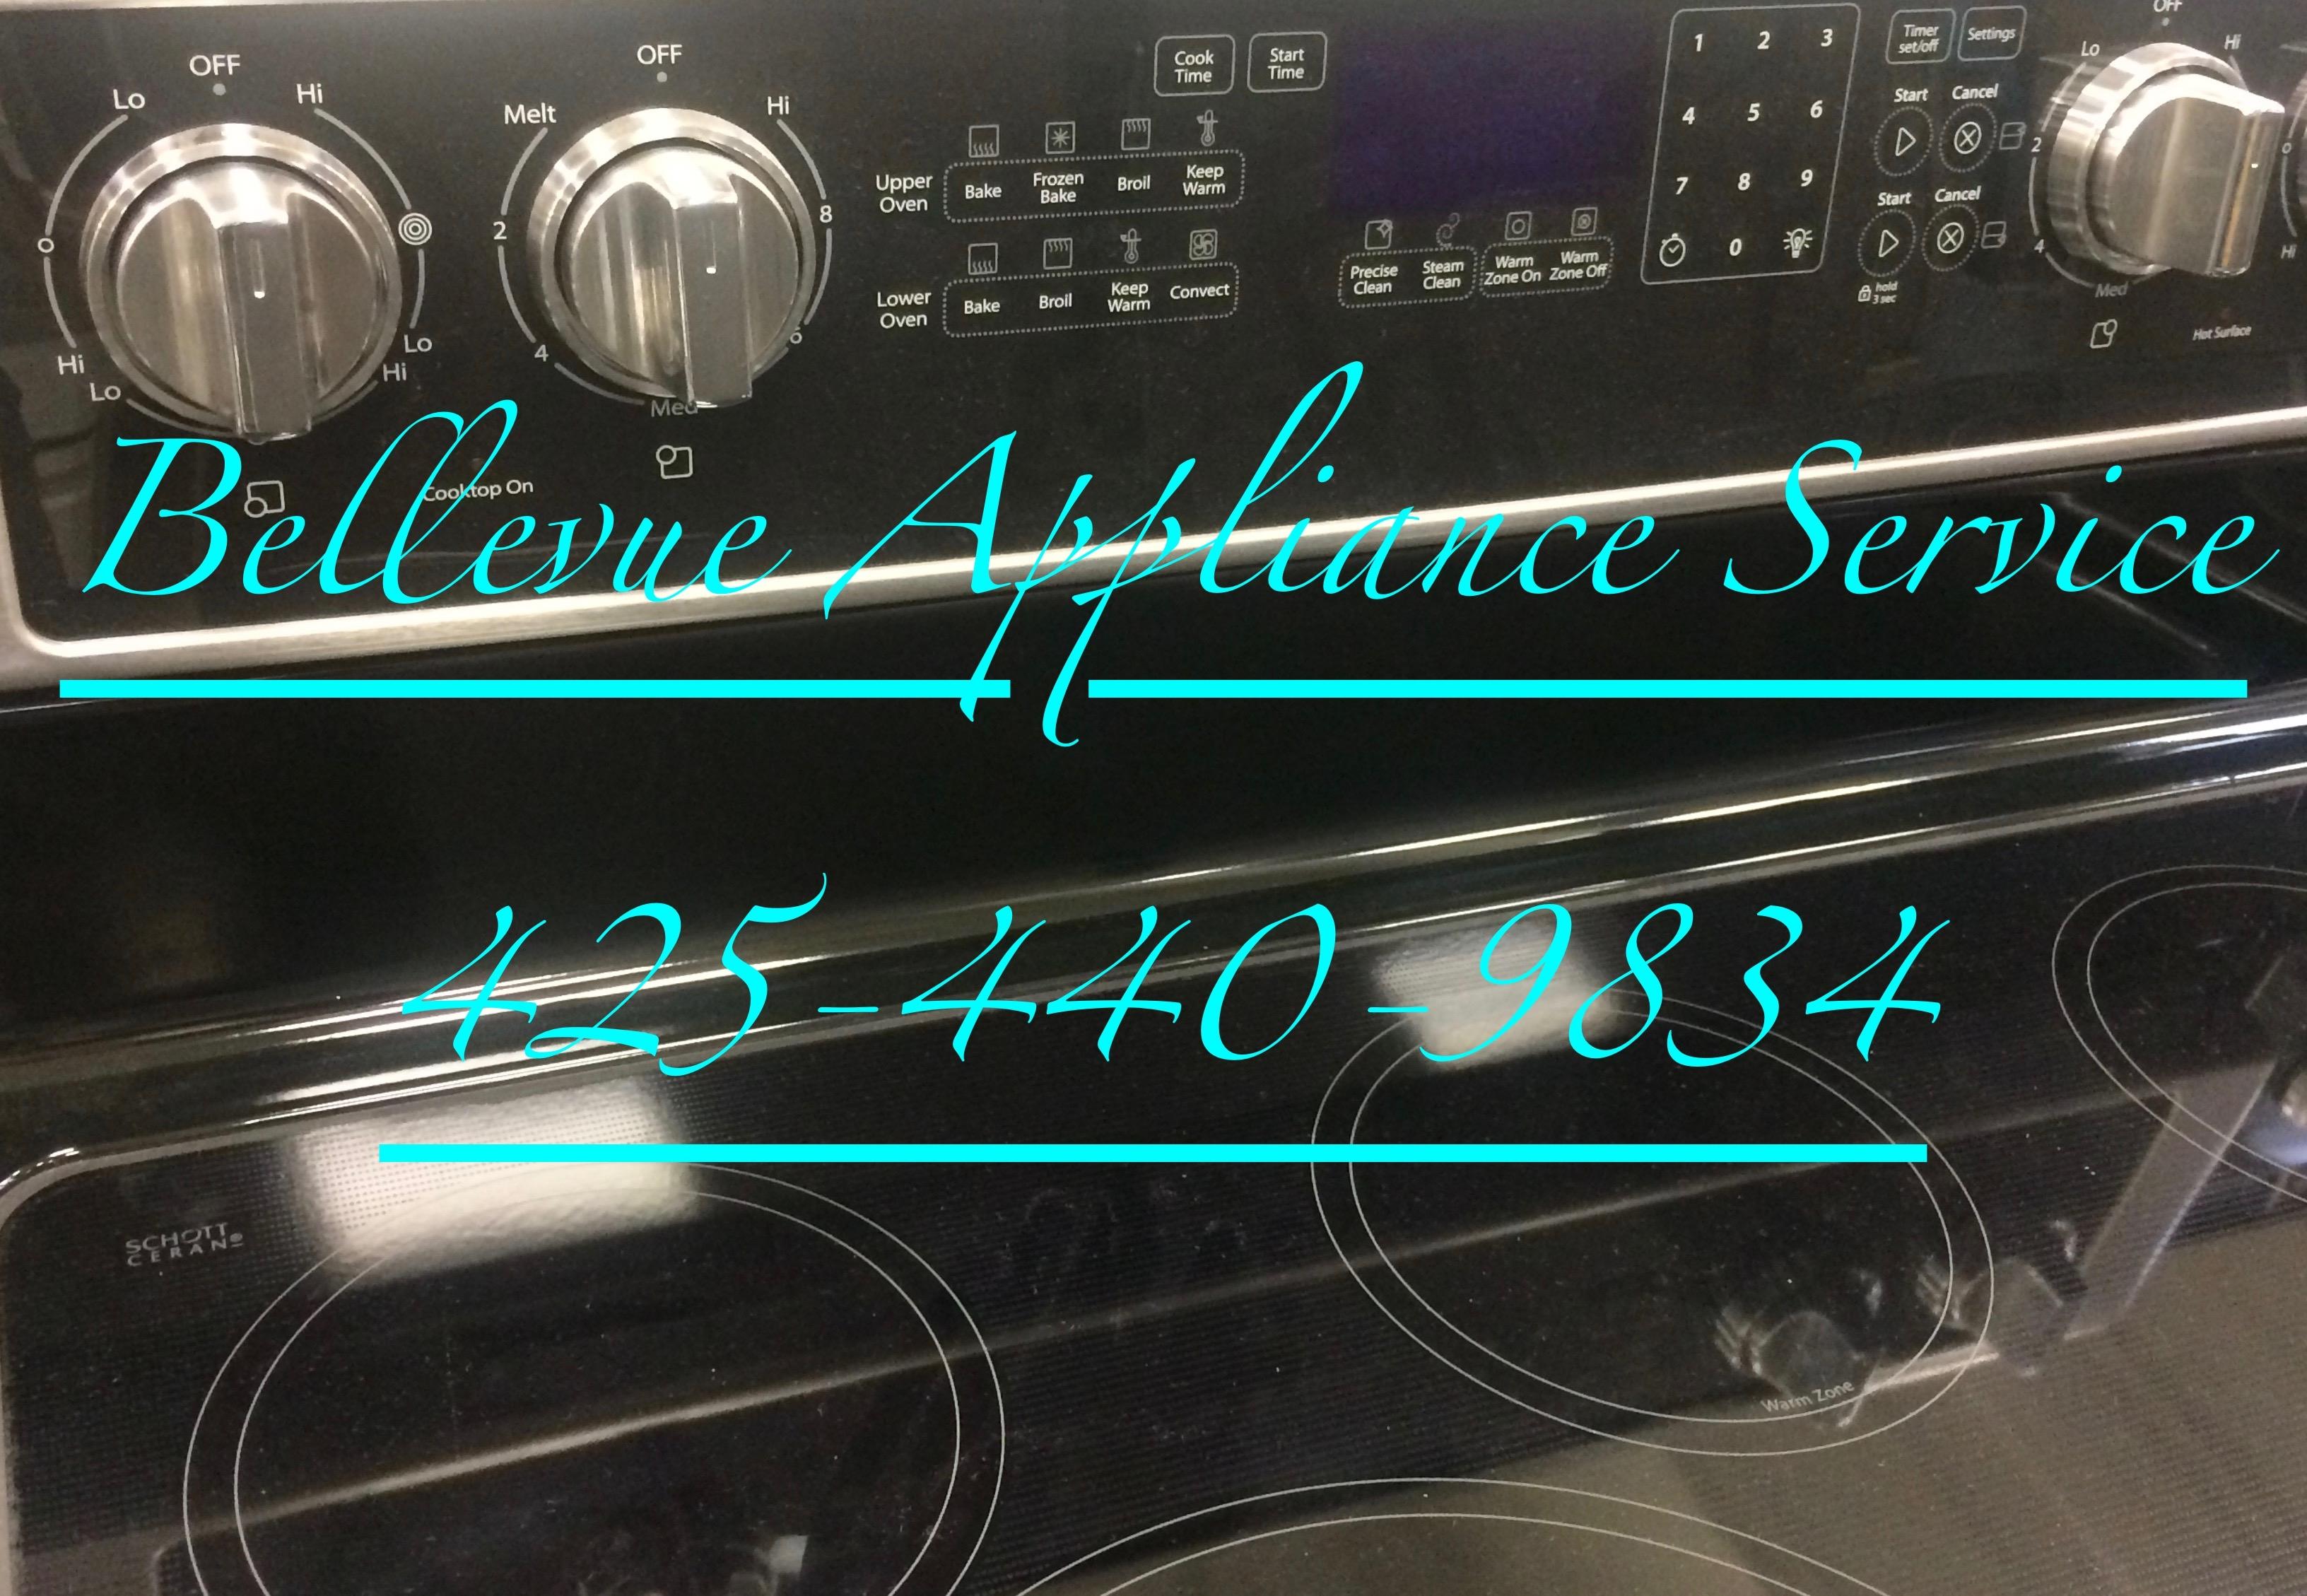 Bellevue Appliance Service image 10